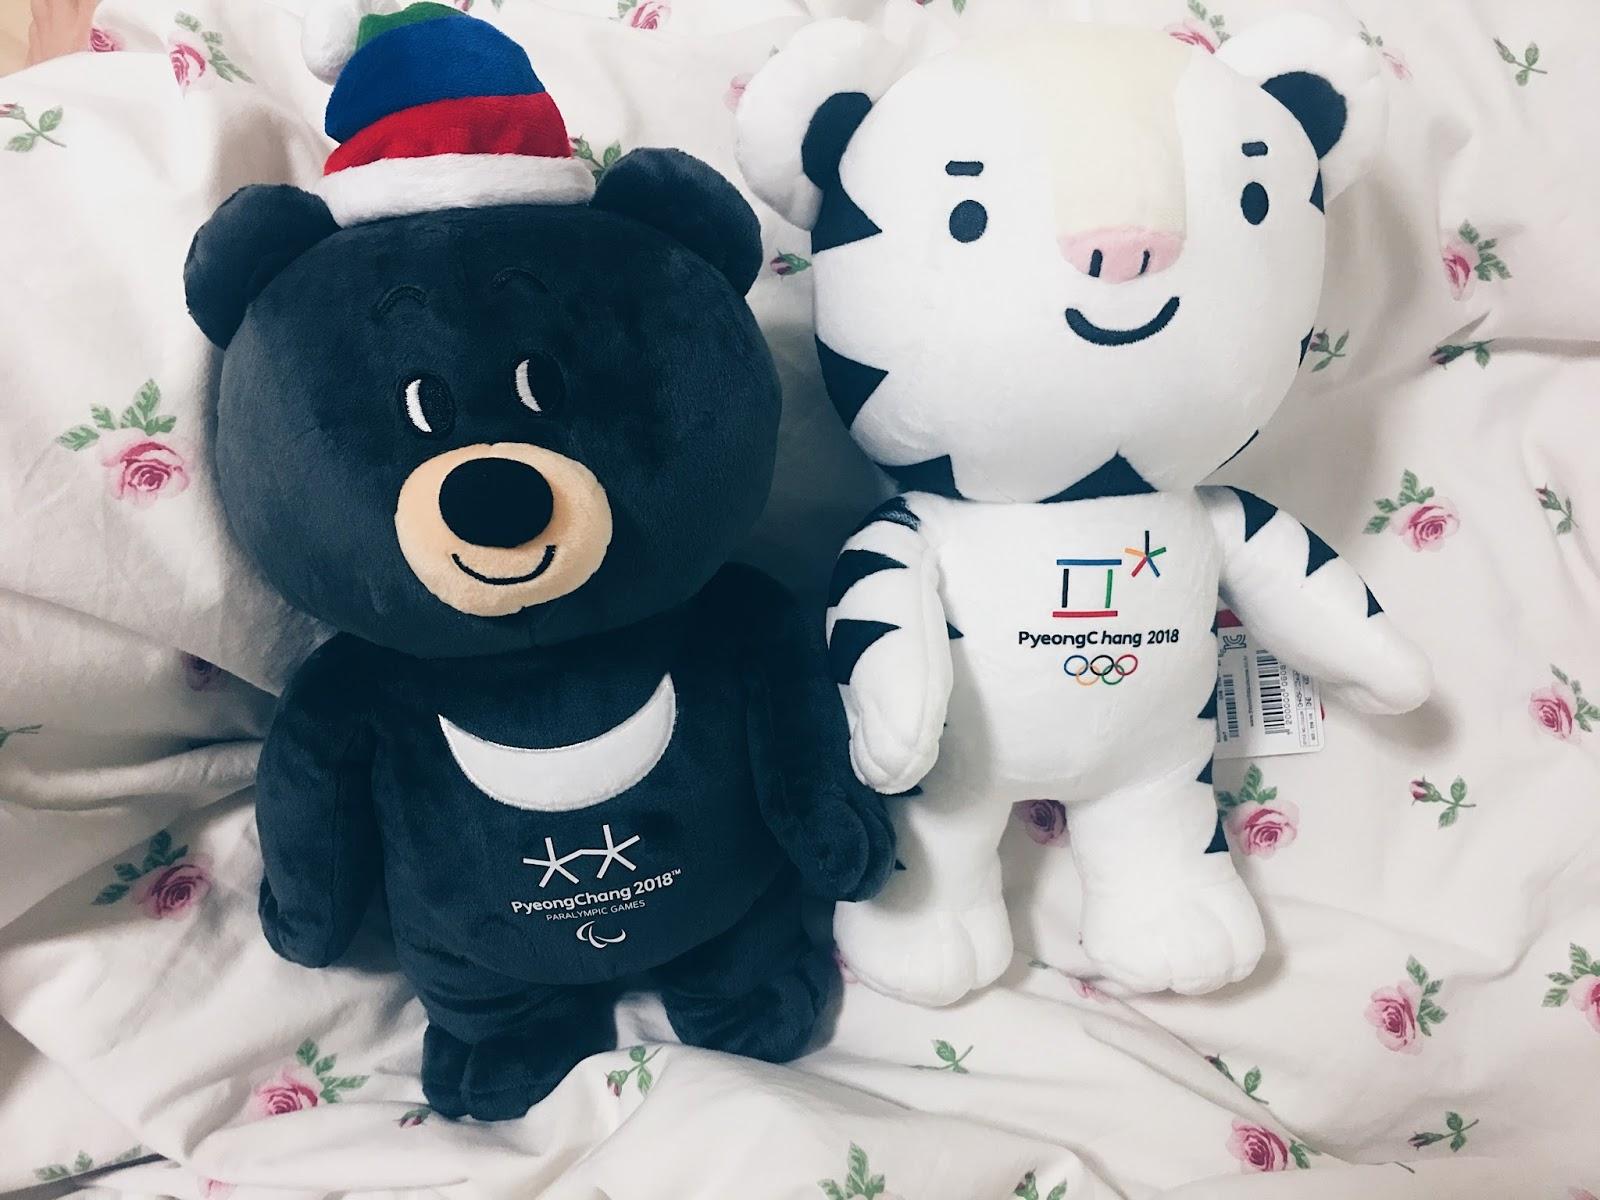 Hipsterkoala PyeongChang Winter Olympics 2018 1600x1200